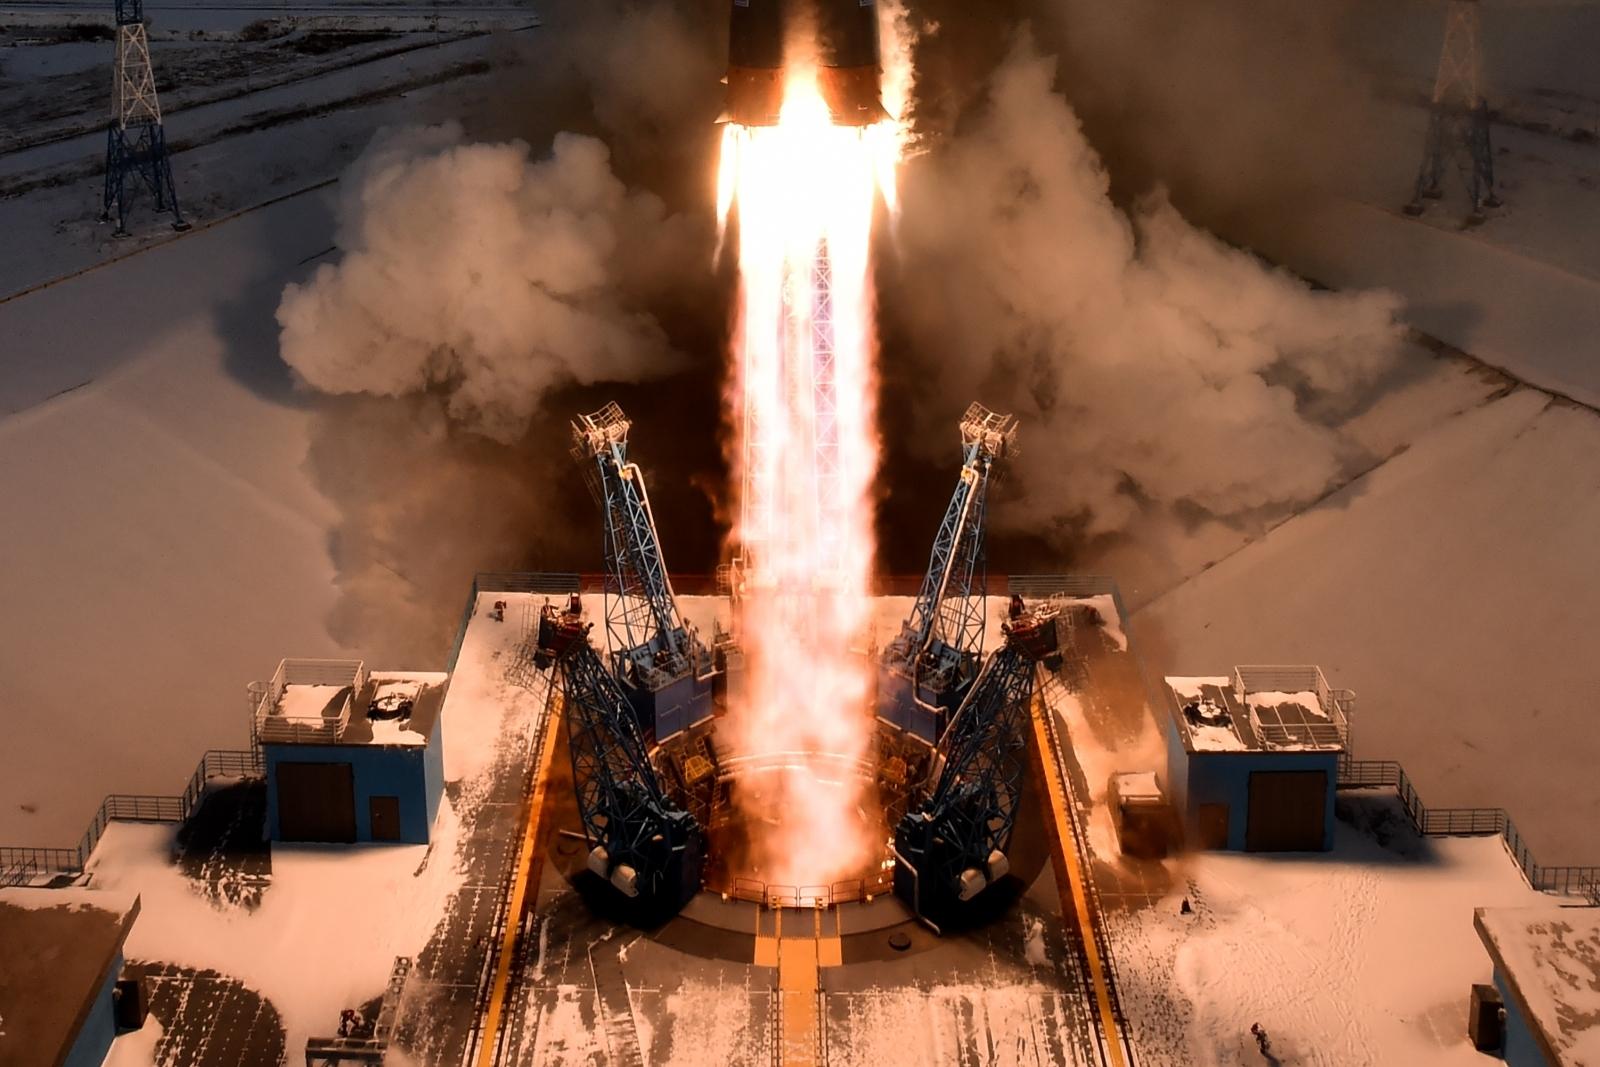 Russia's Meteor-M 2-1